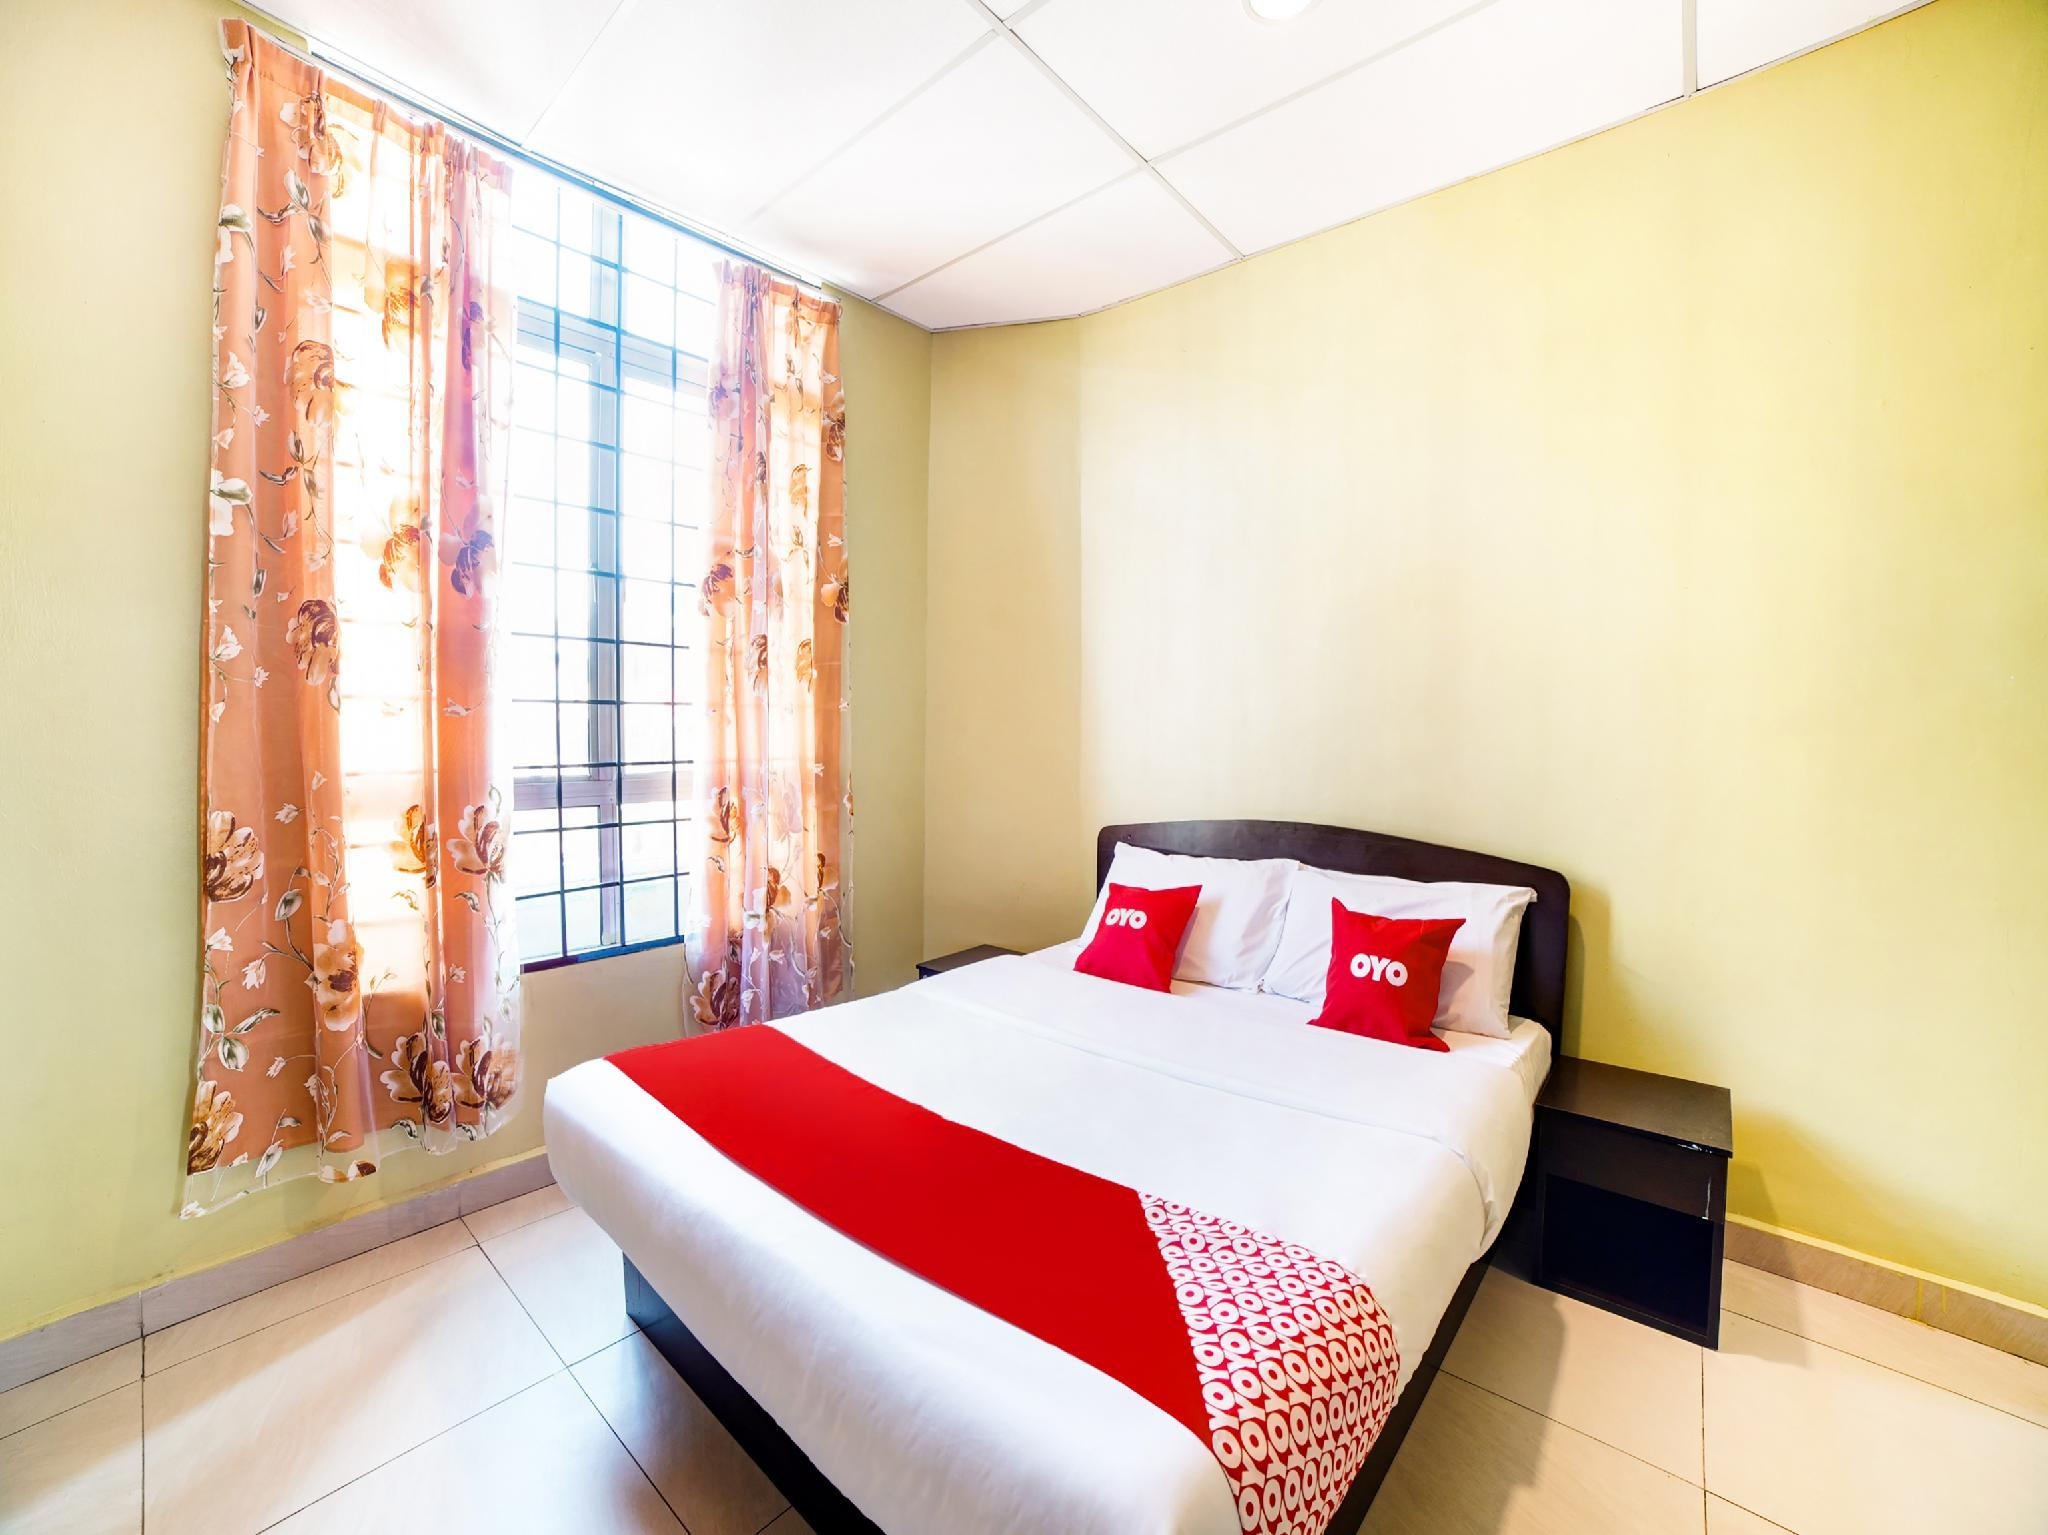 OYO 89573 Hotel Lii View